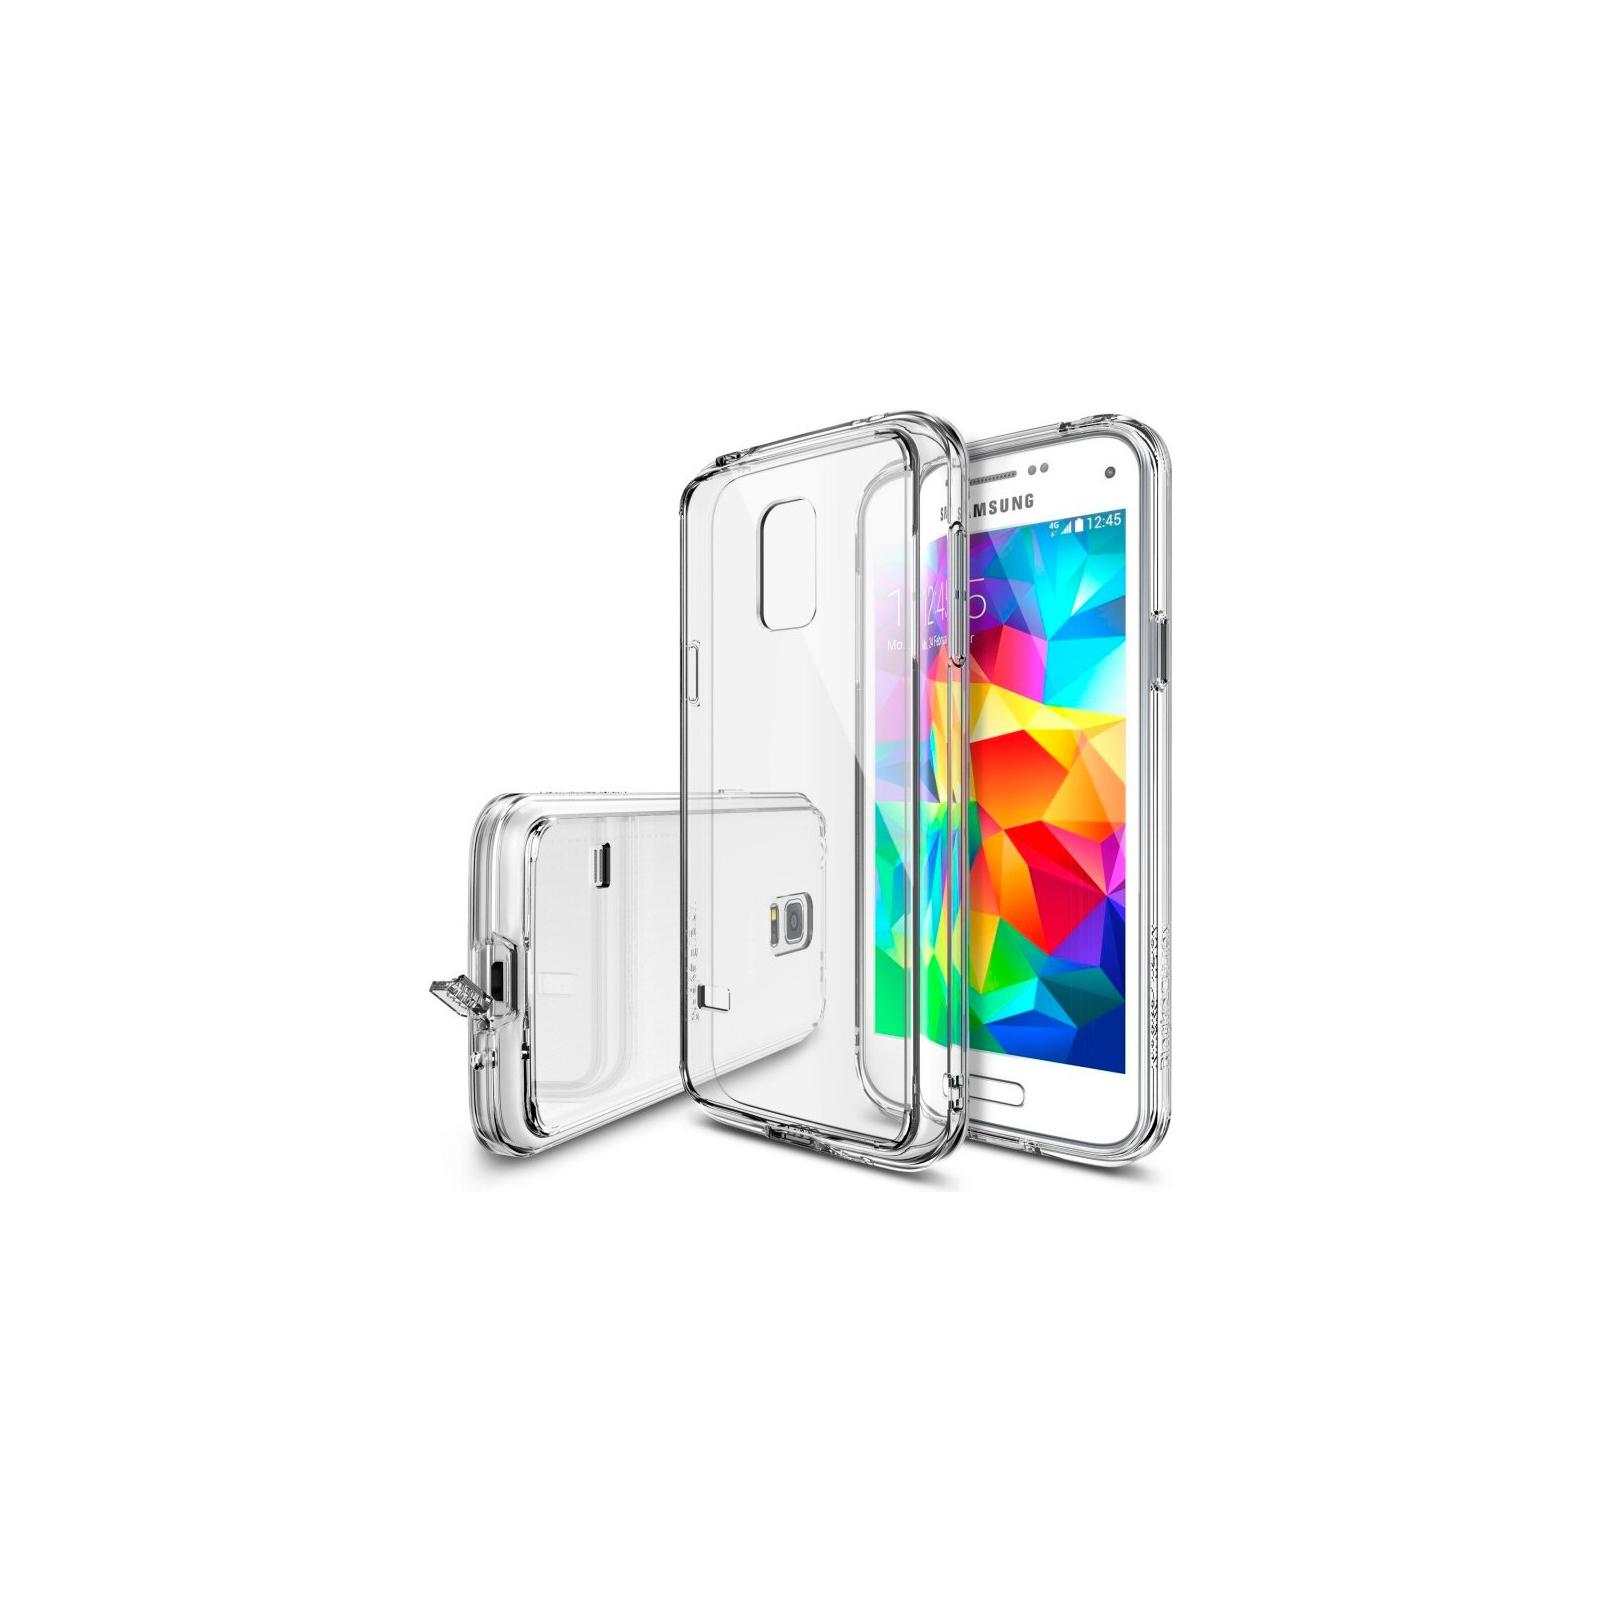 Чехол для моб. телефона Ringke Fusion для Samsung Galaxy S5 (Crystal view) (156933)